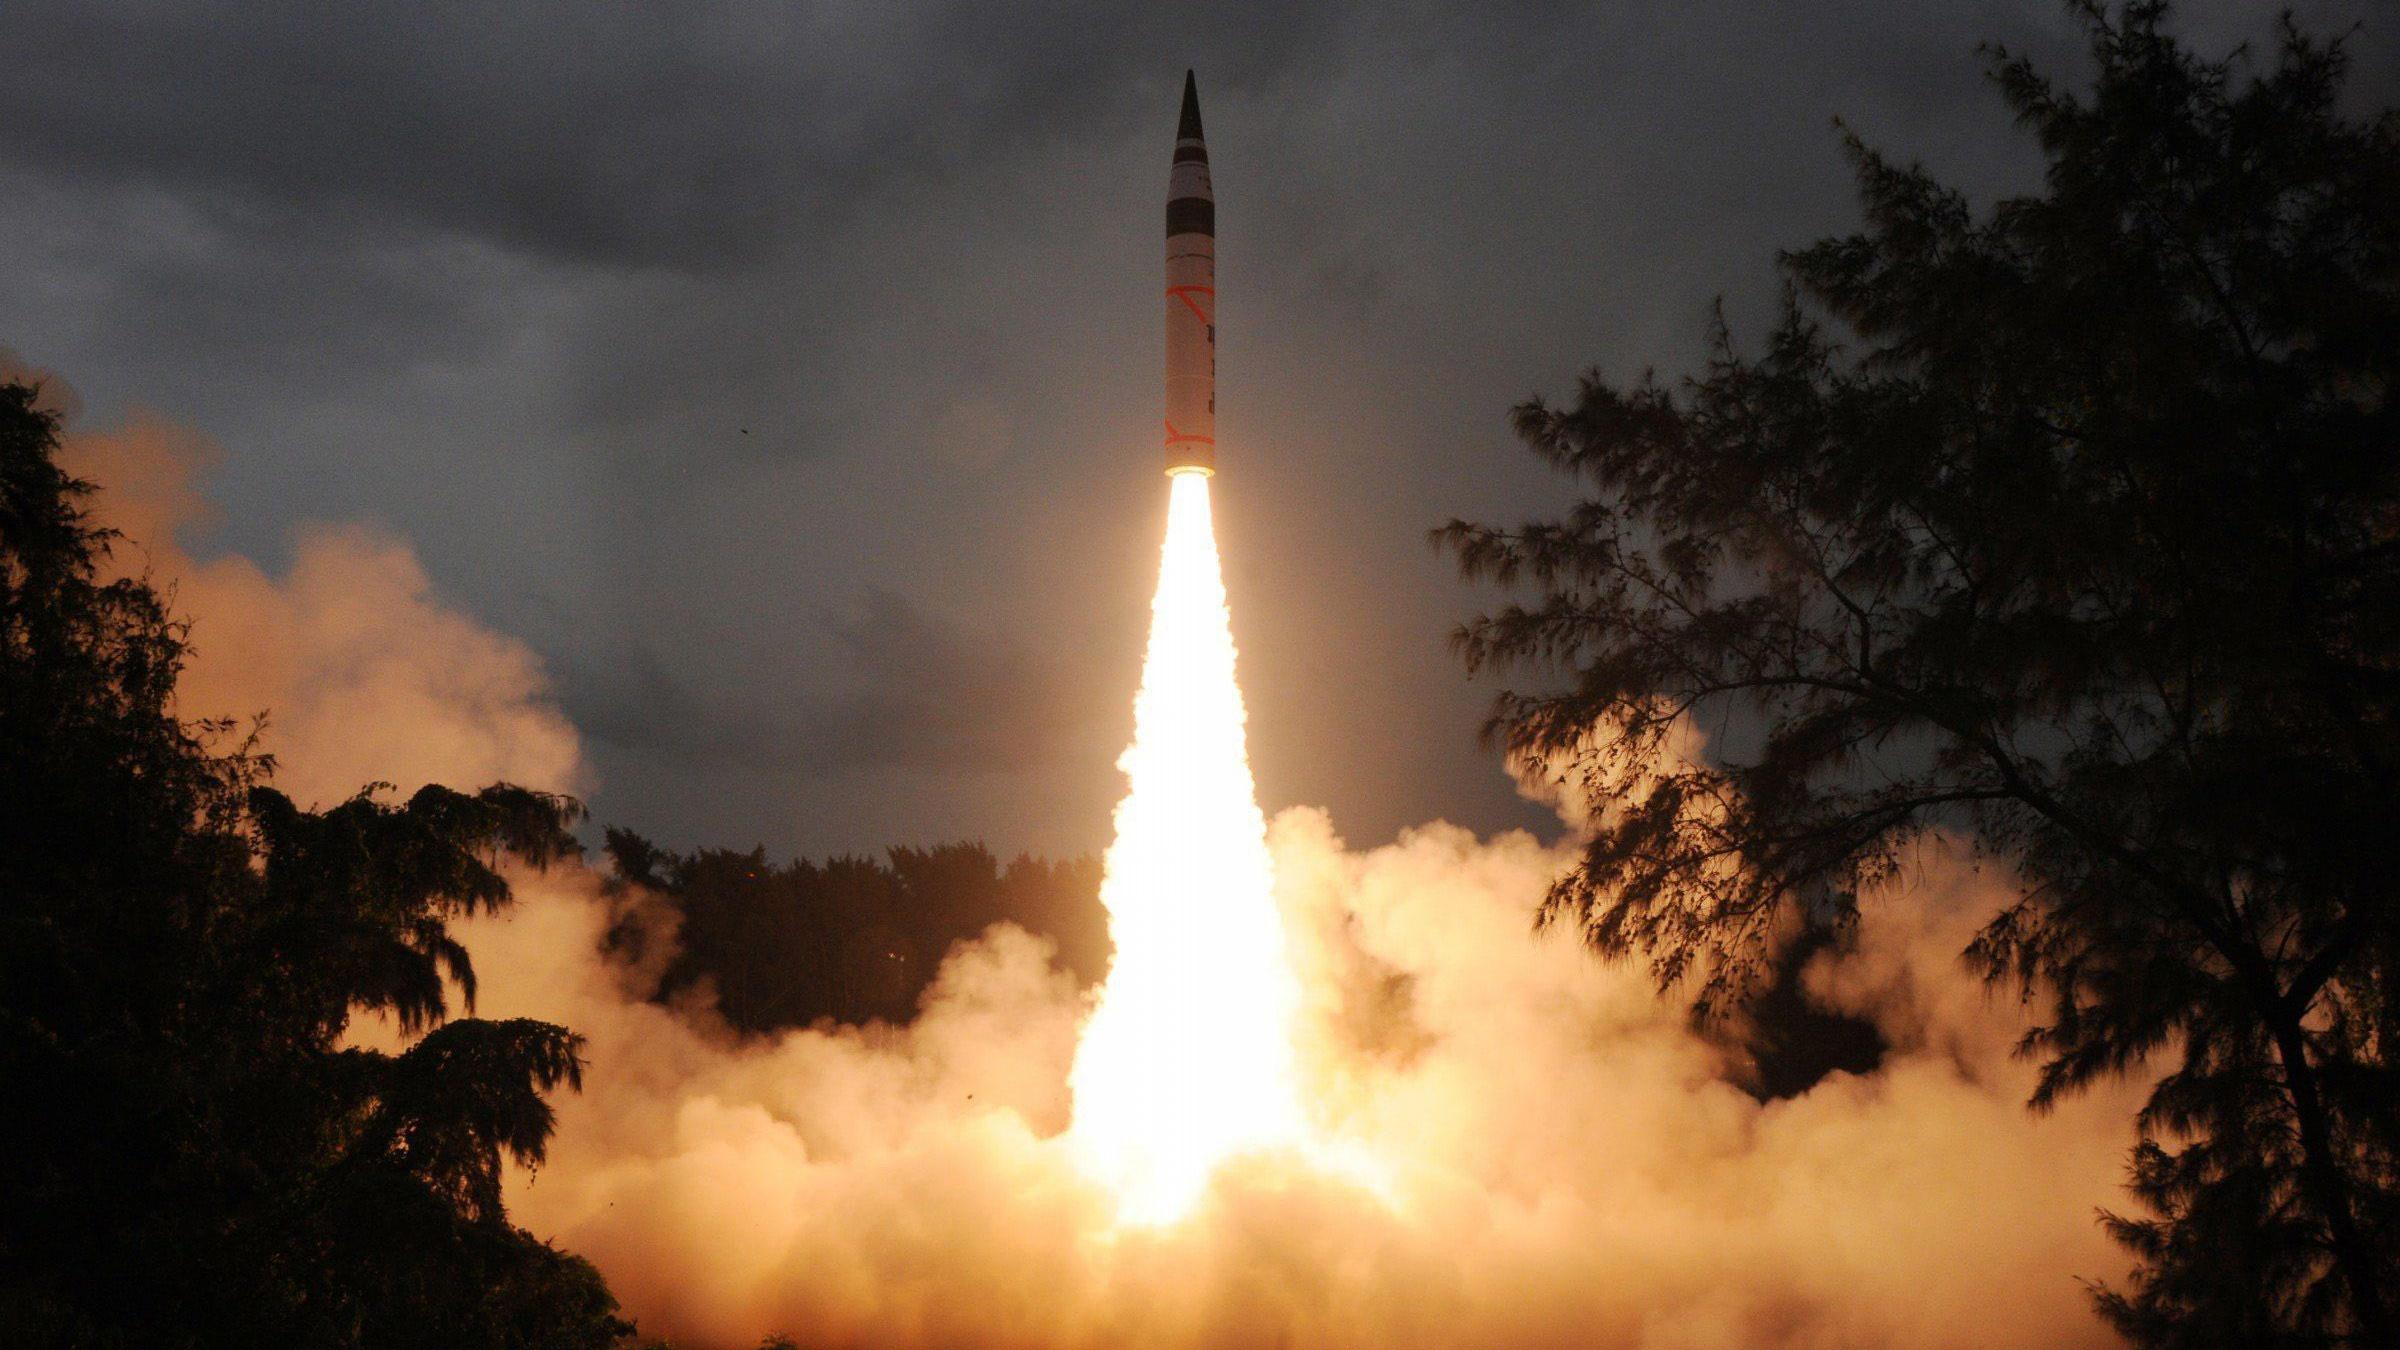 intercontinental ballistic missile india - HD2144×1424